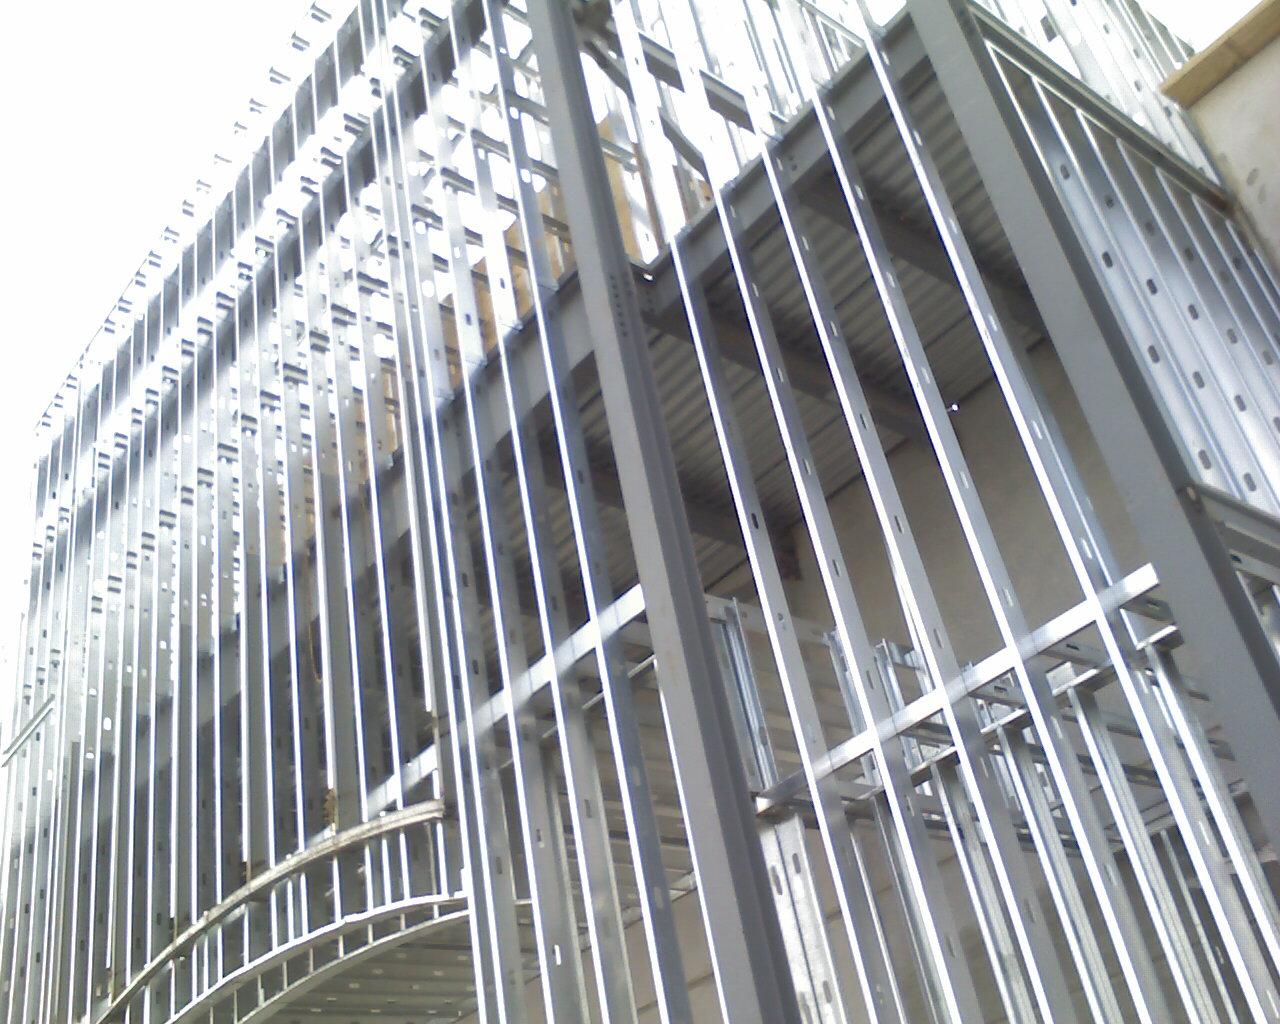 Multi Drywall Partition Llc : Flash construction co llc services